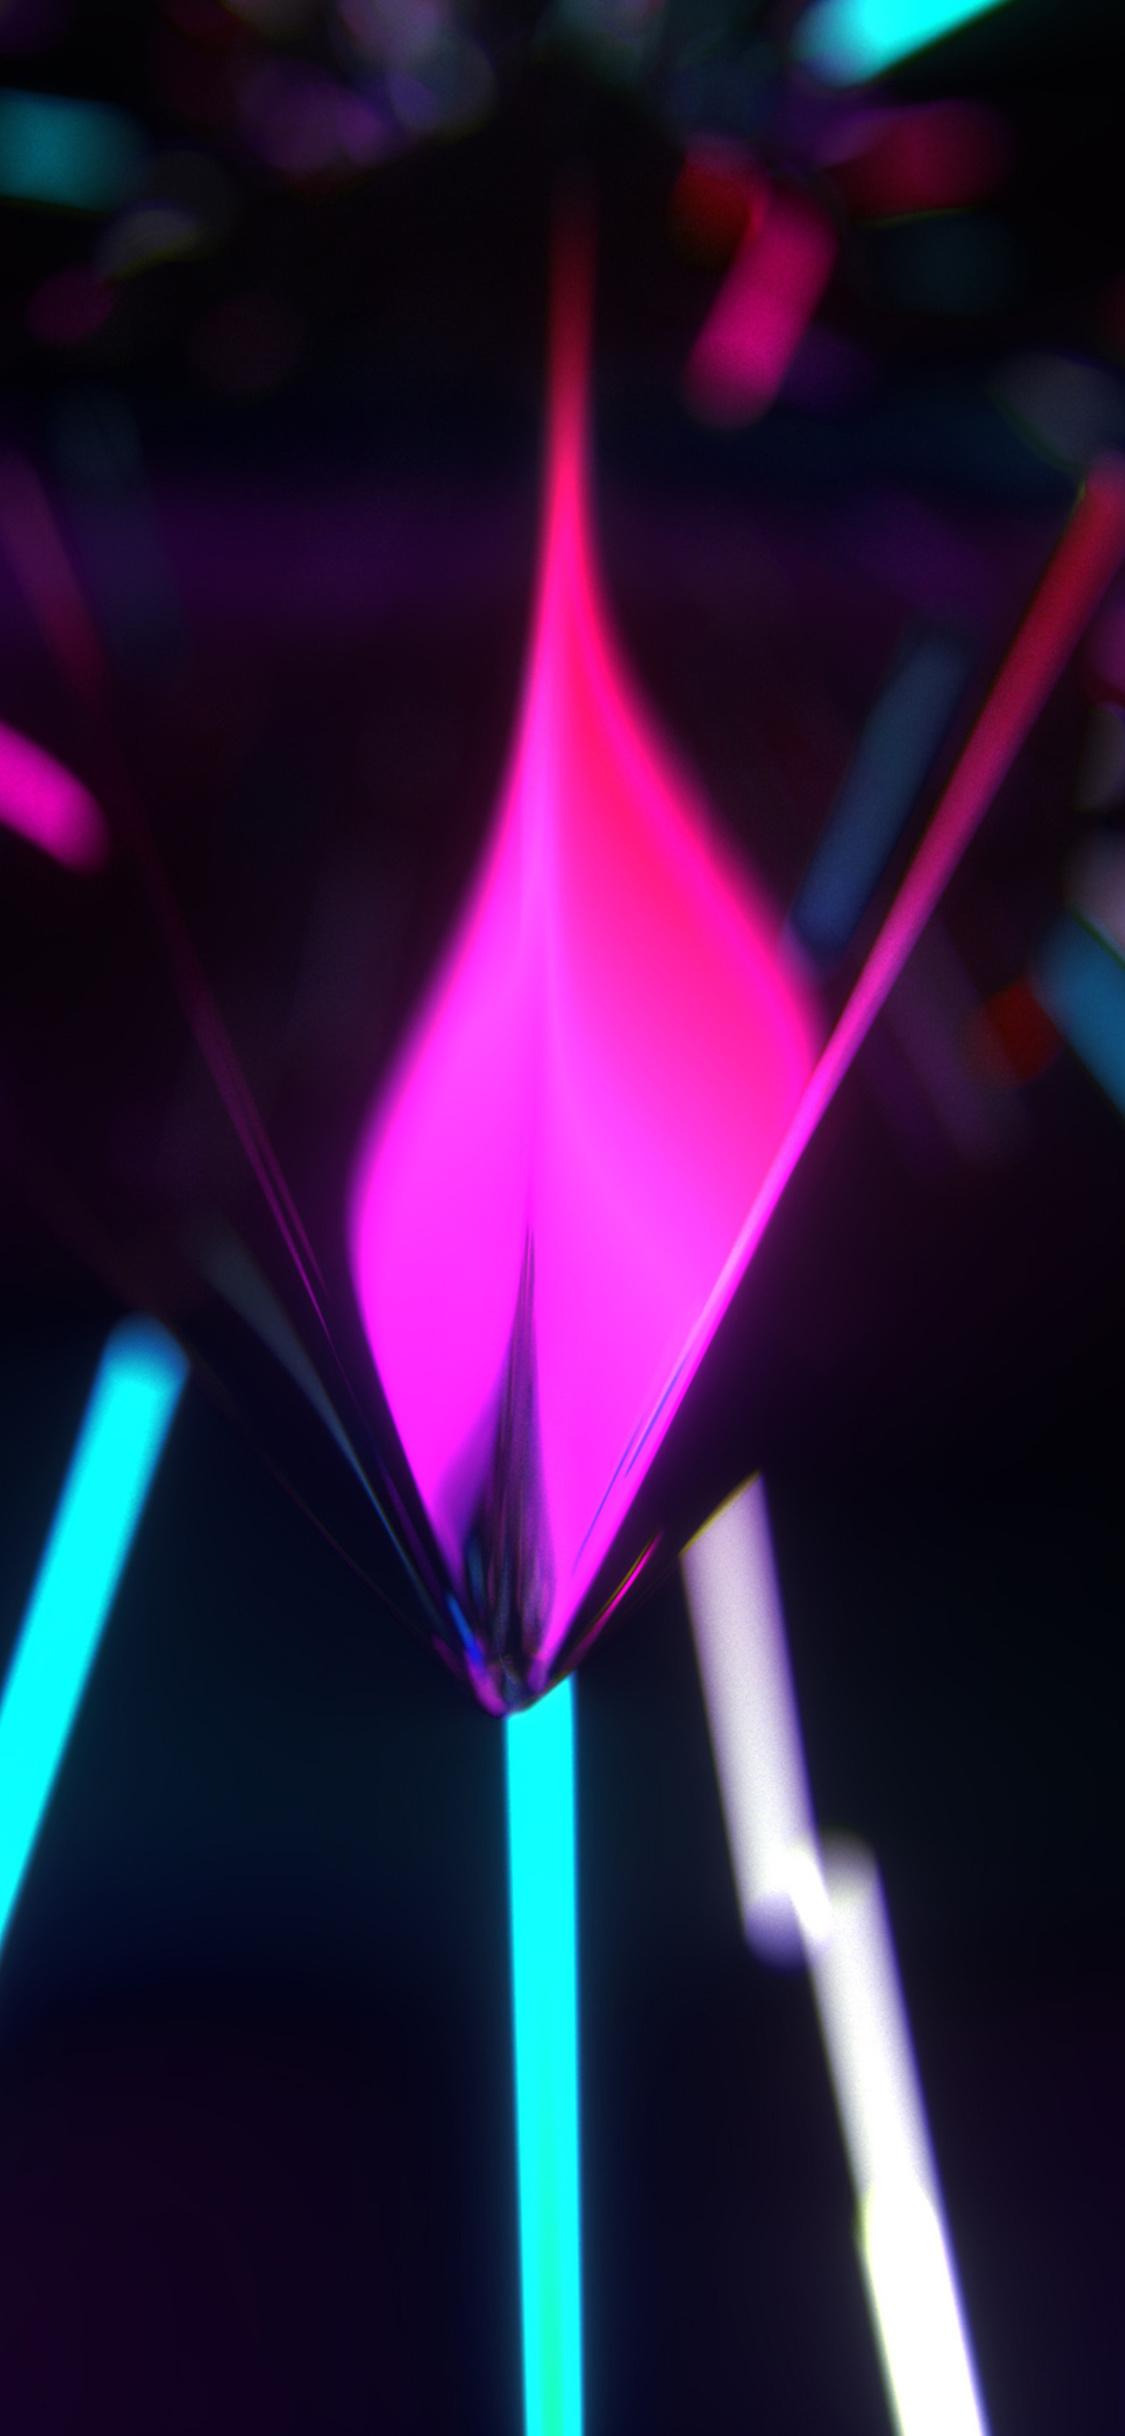 1125x2436 Neon Glow Abstract Iphone Xs Iphone 10 Iphone X Hd